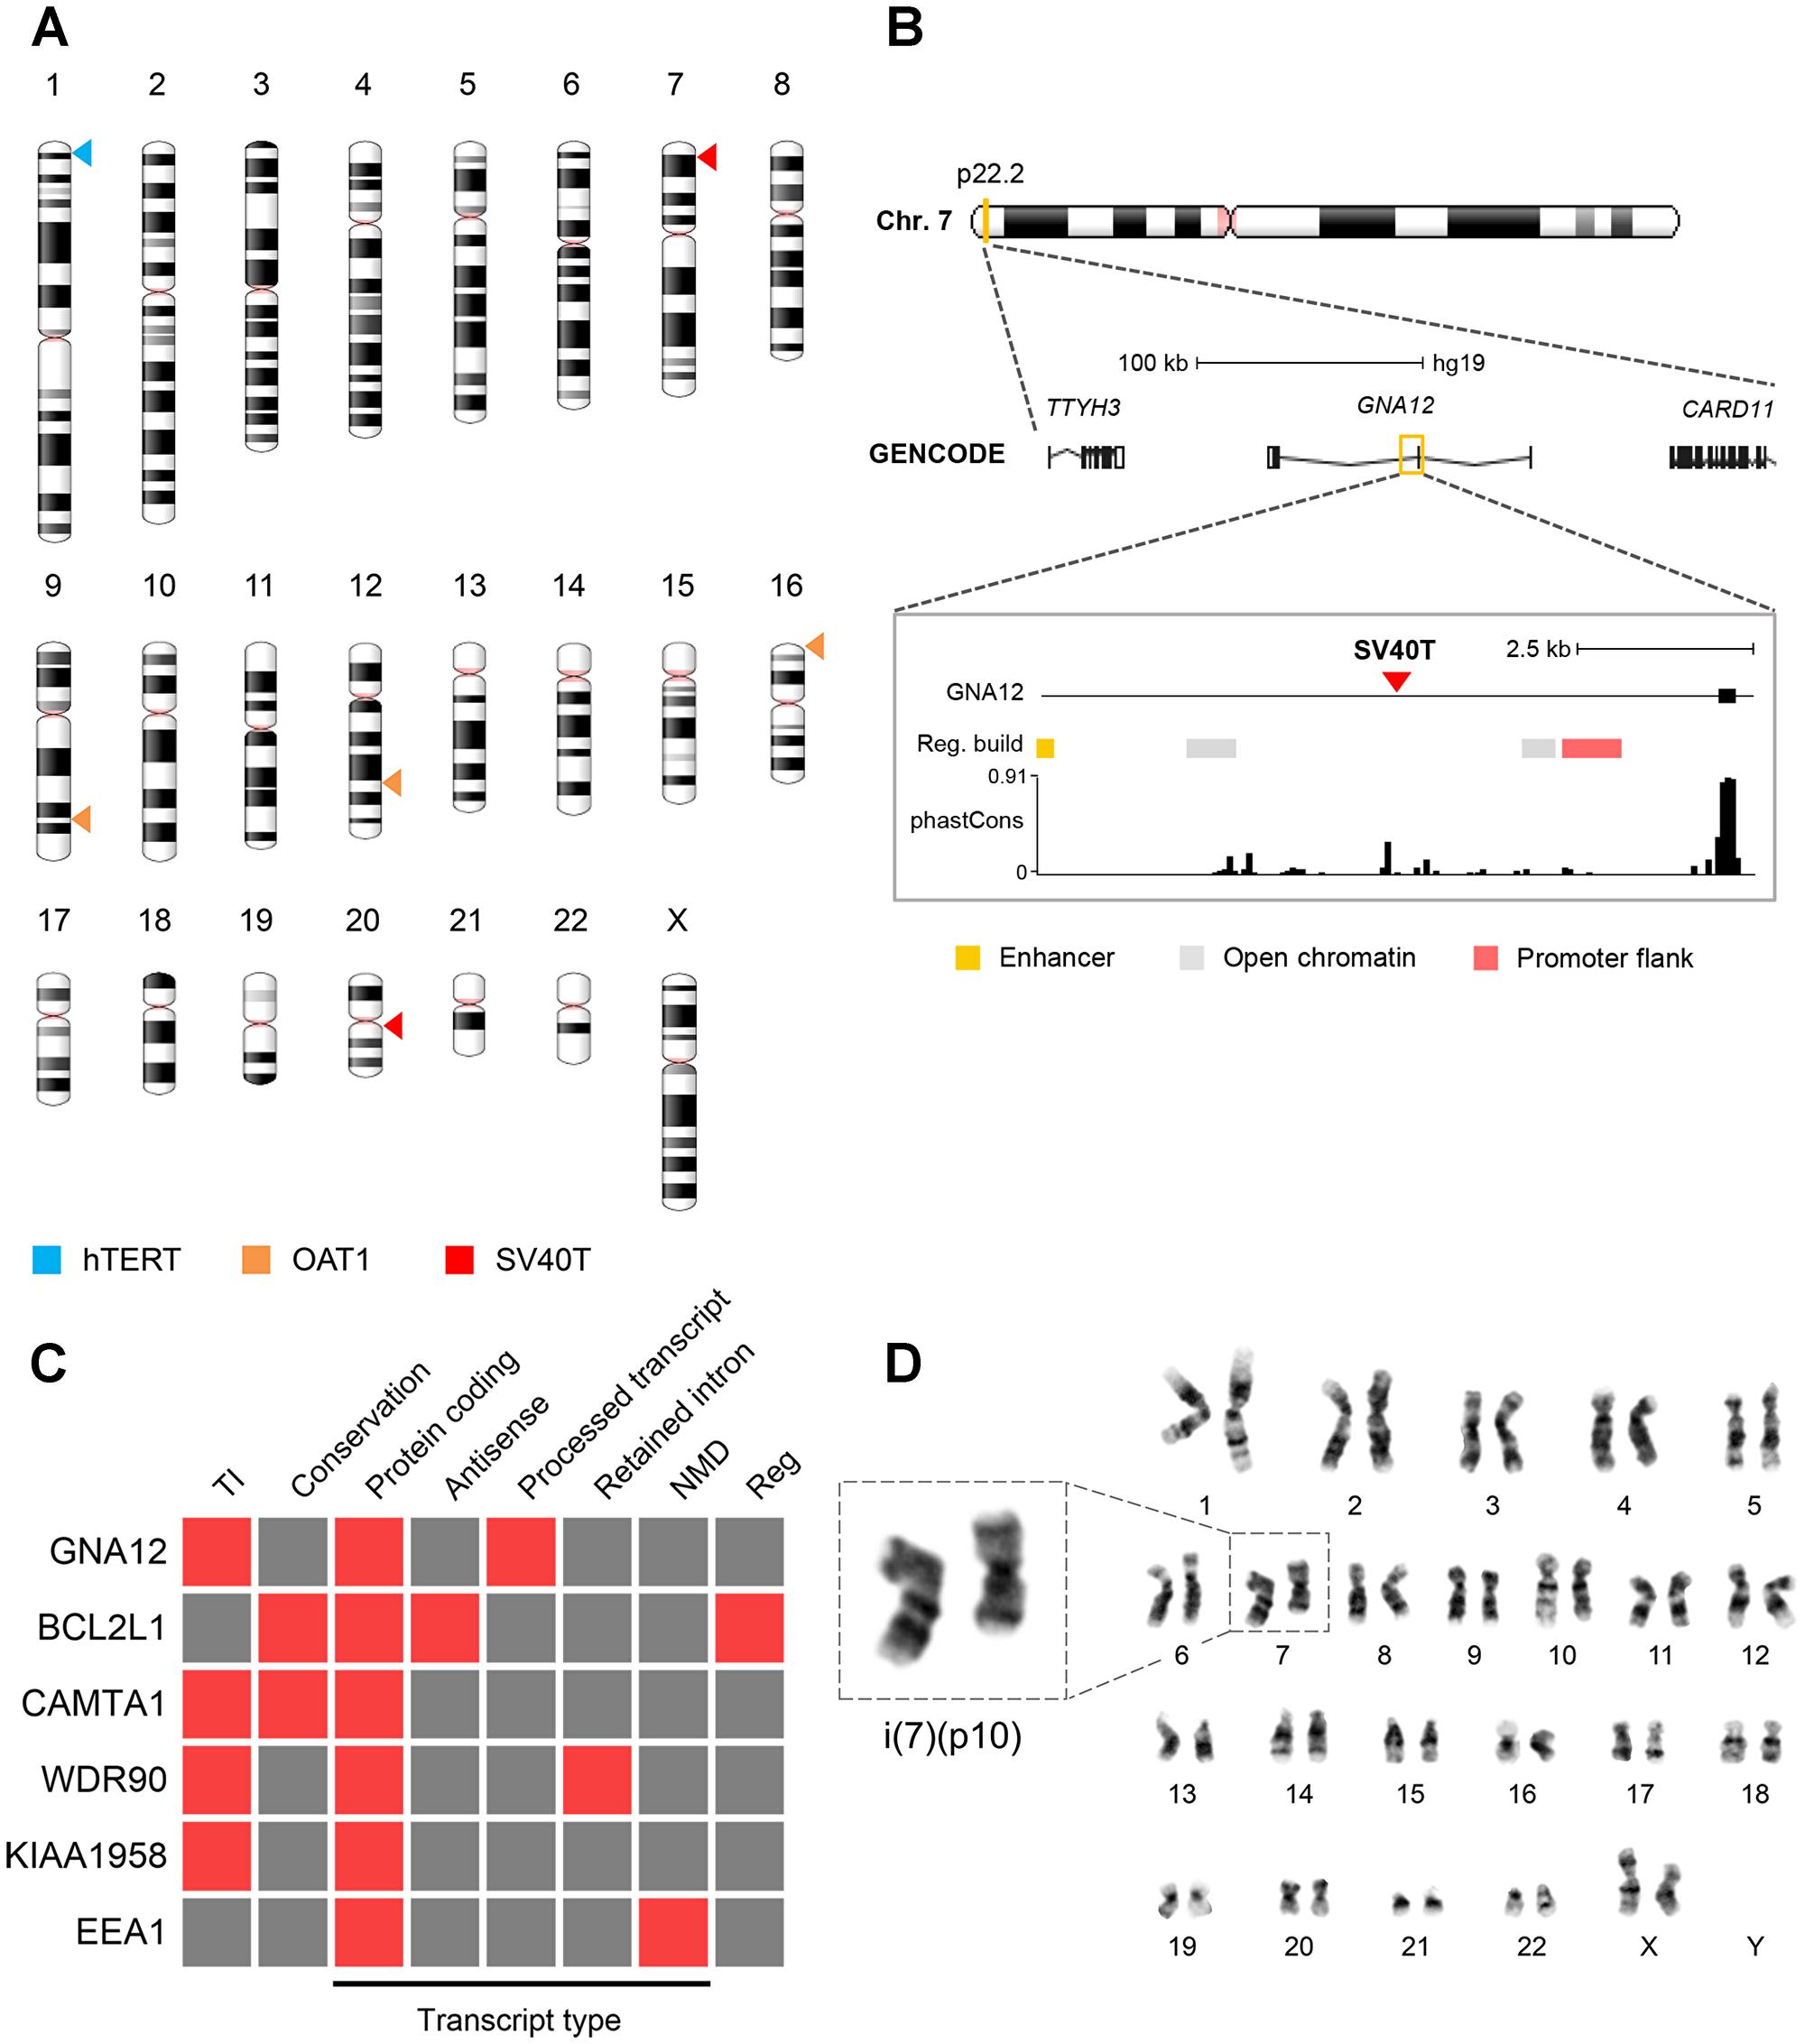 Viral integration sites and chromosomal stability.